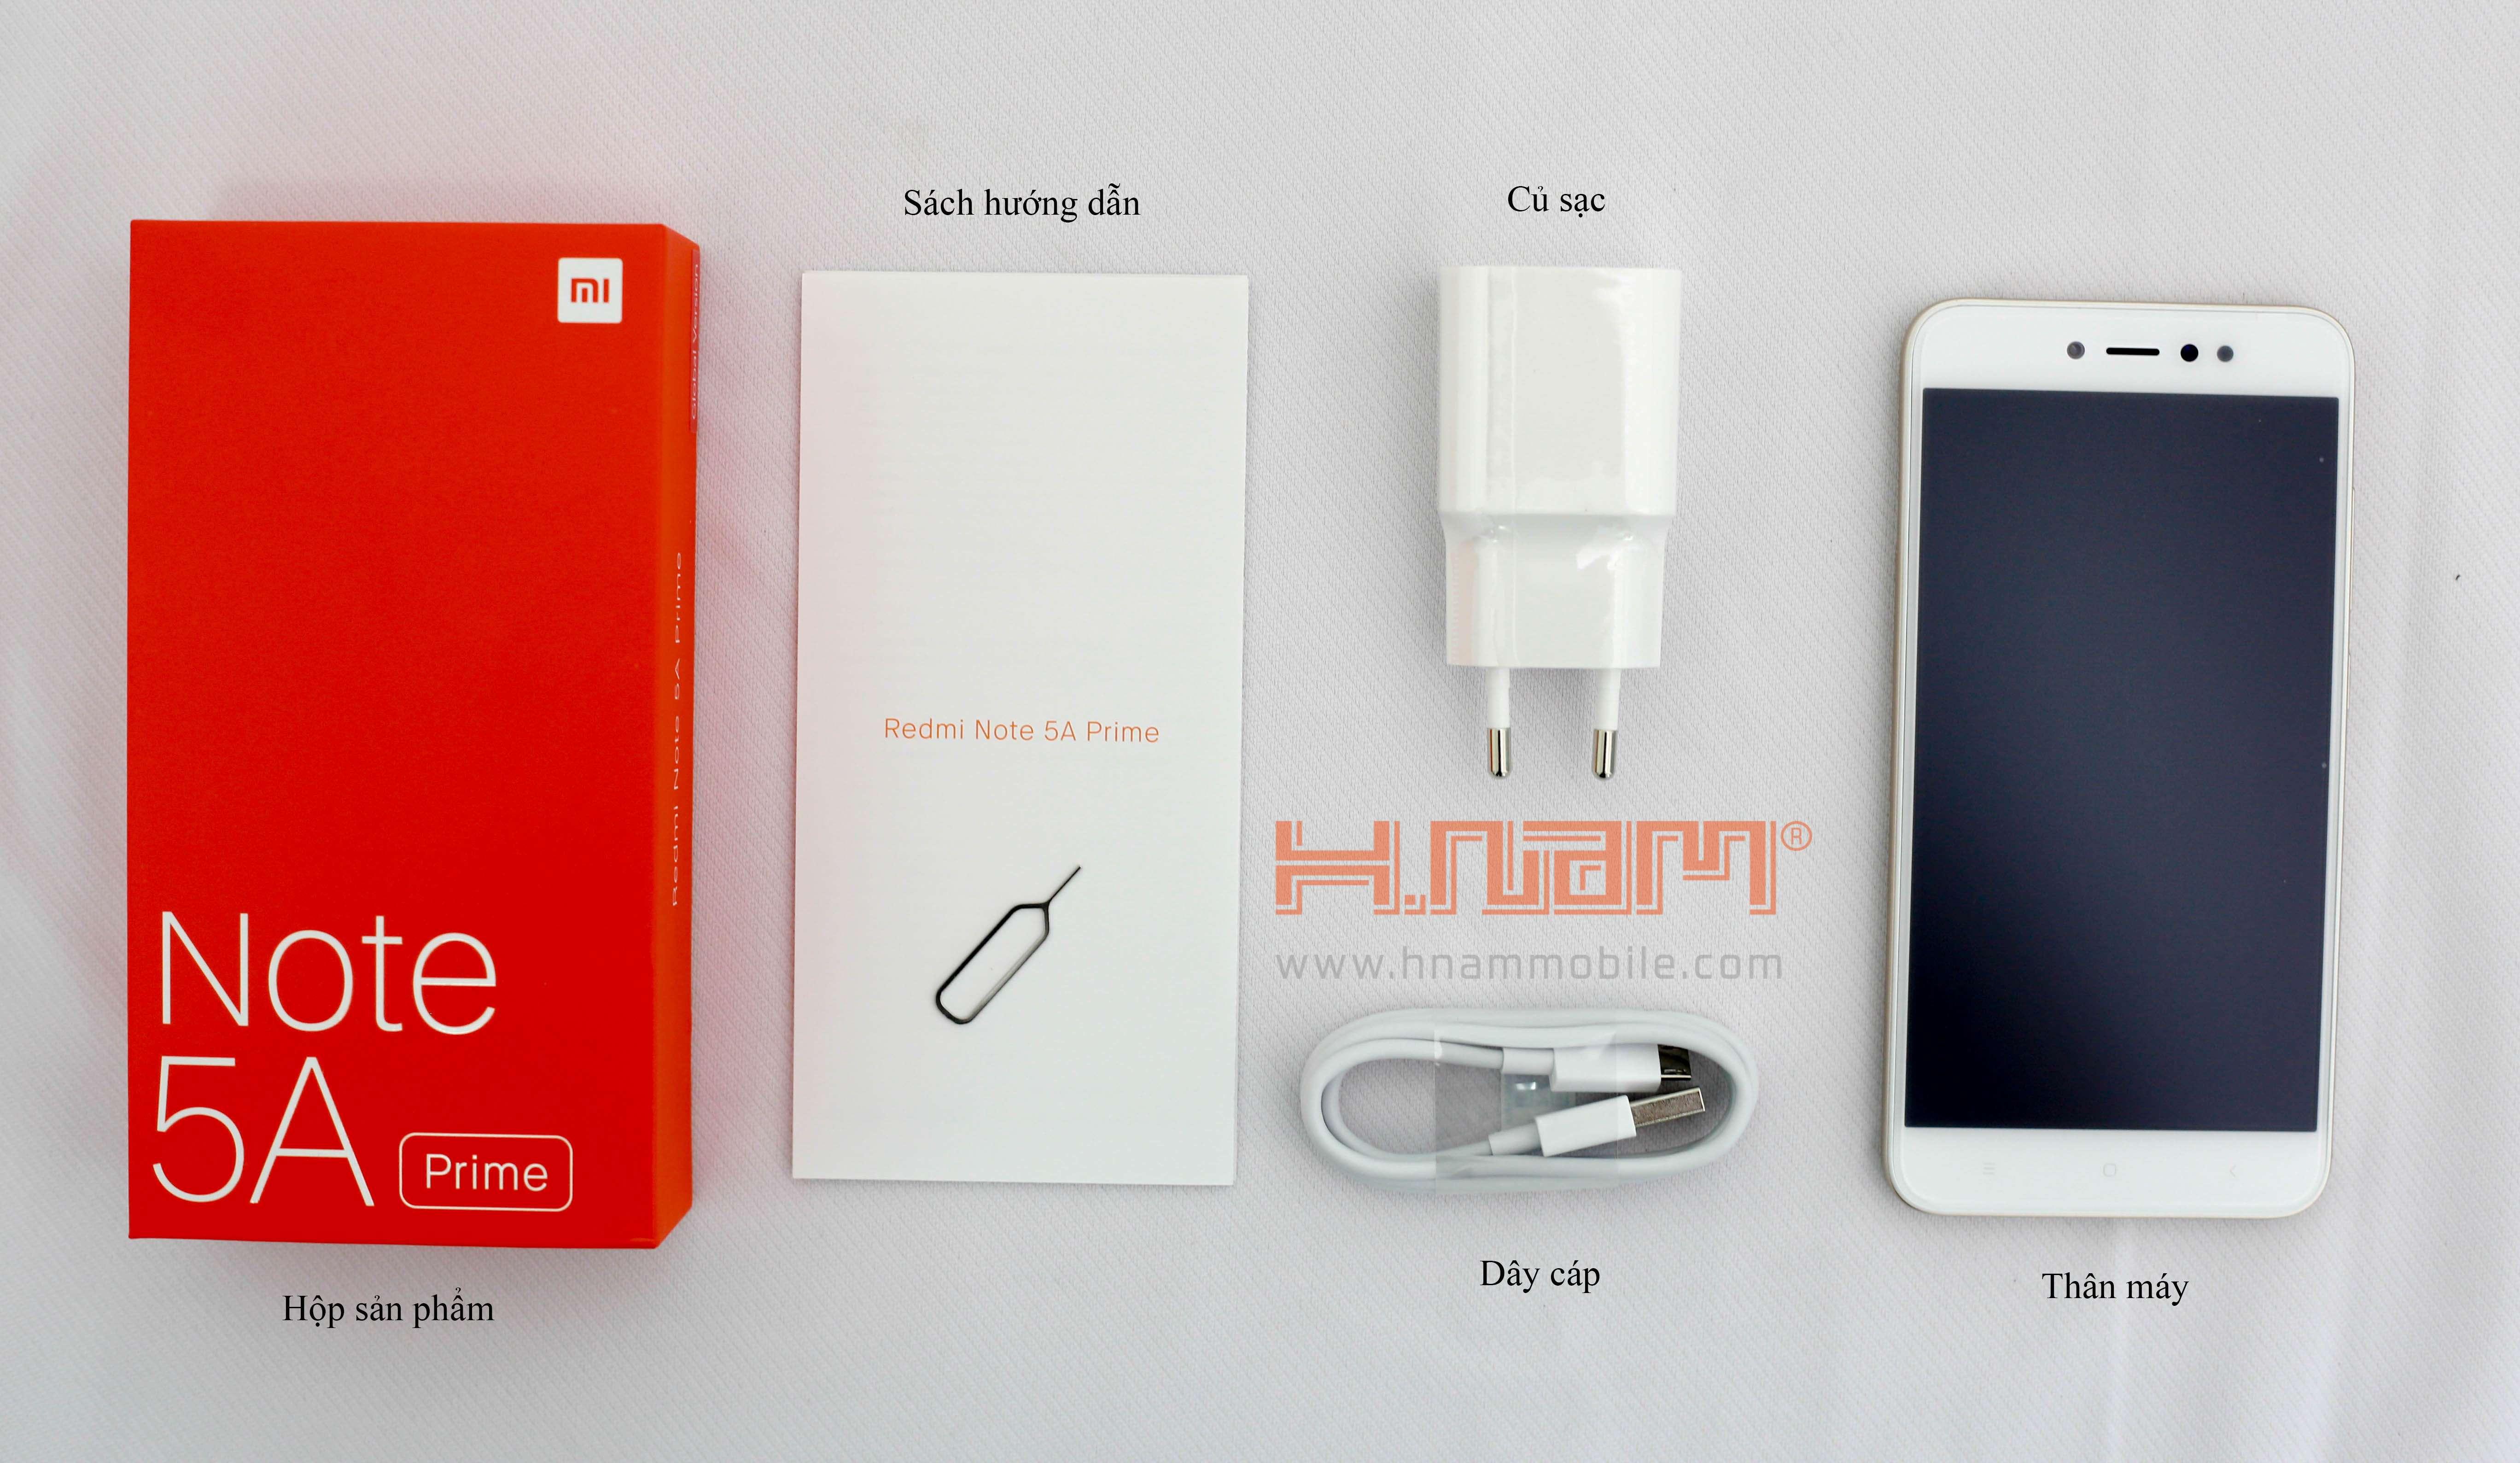 Xiaomi Redmi Note 5A Prime hình sản phẩm 0